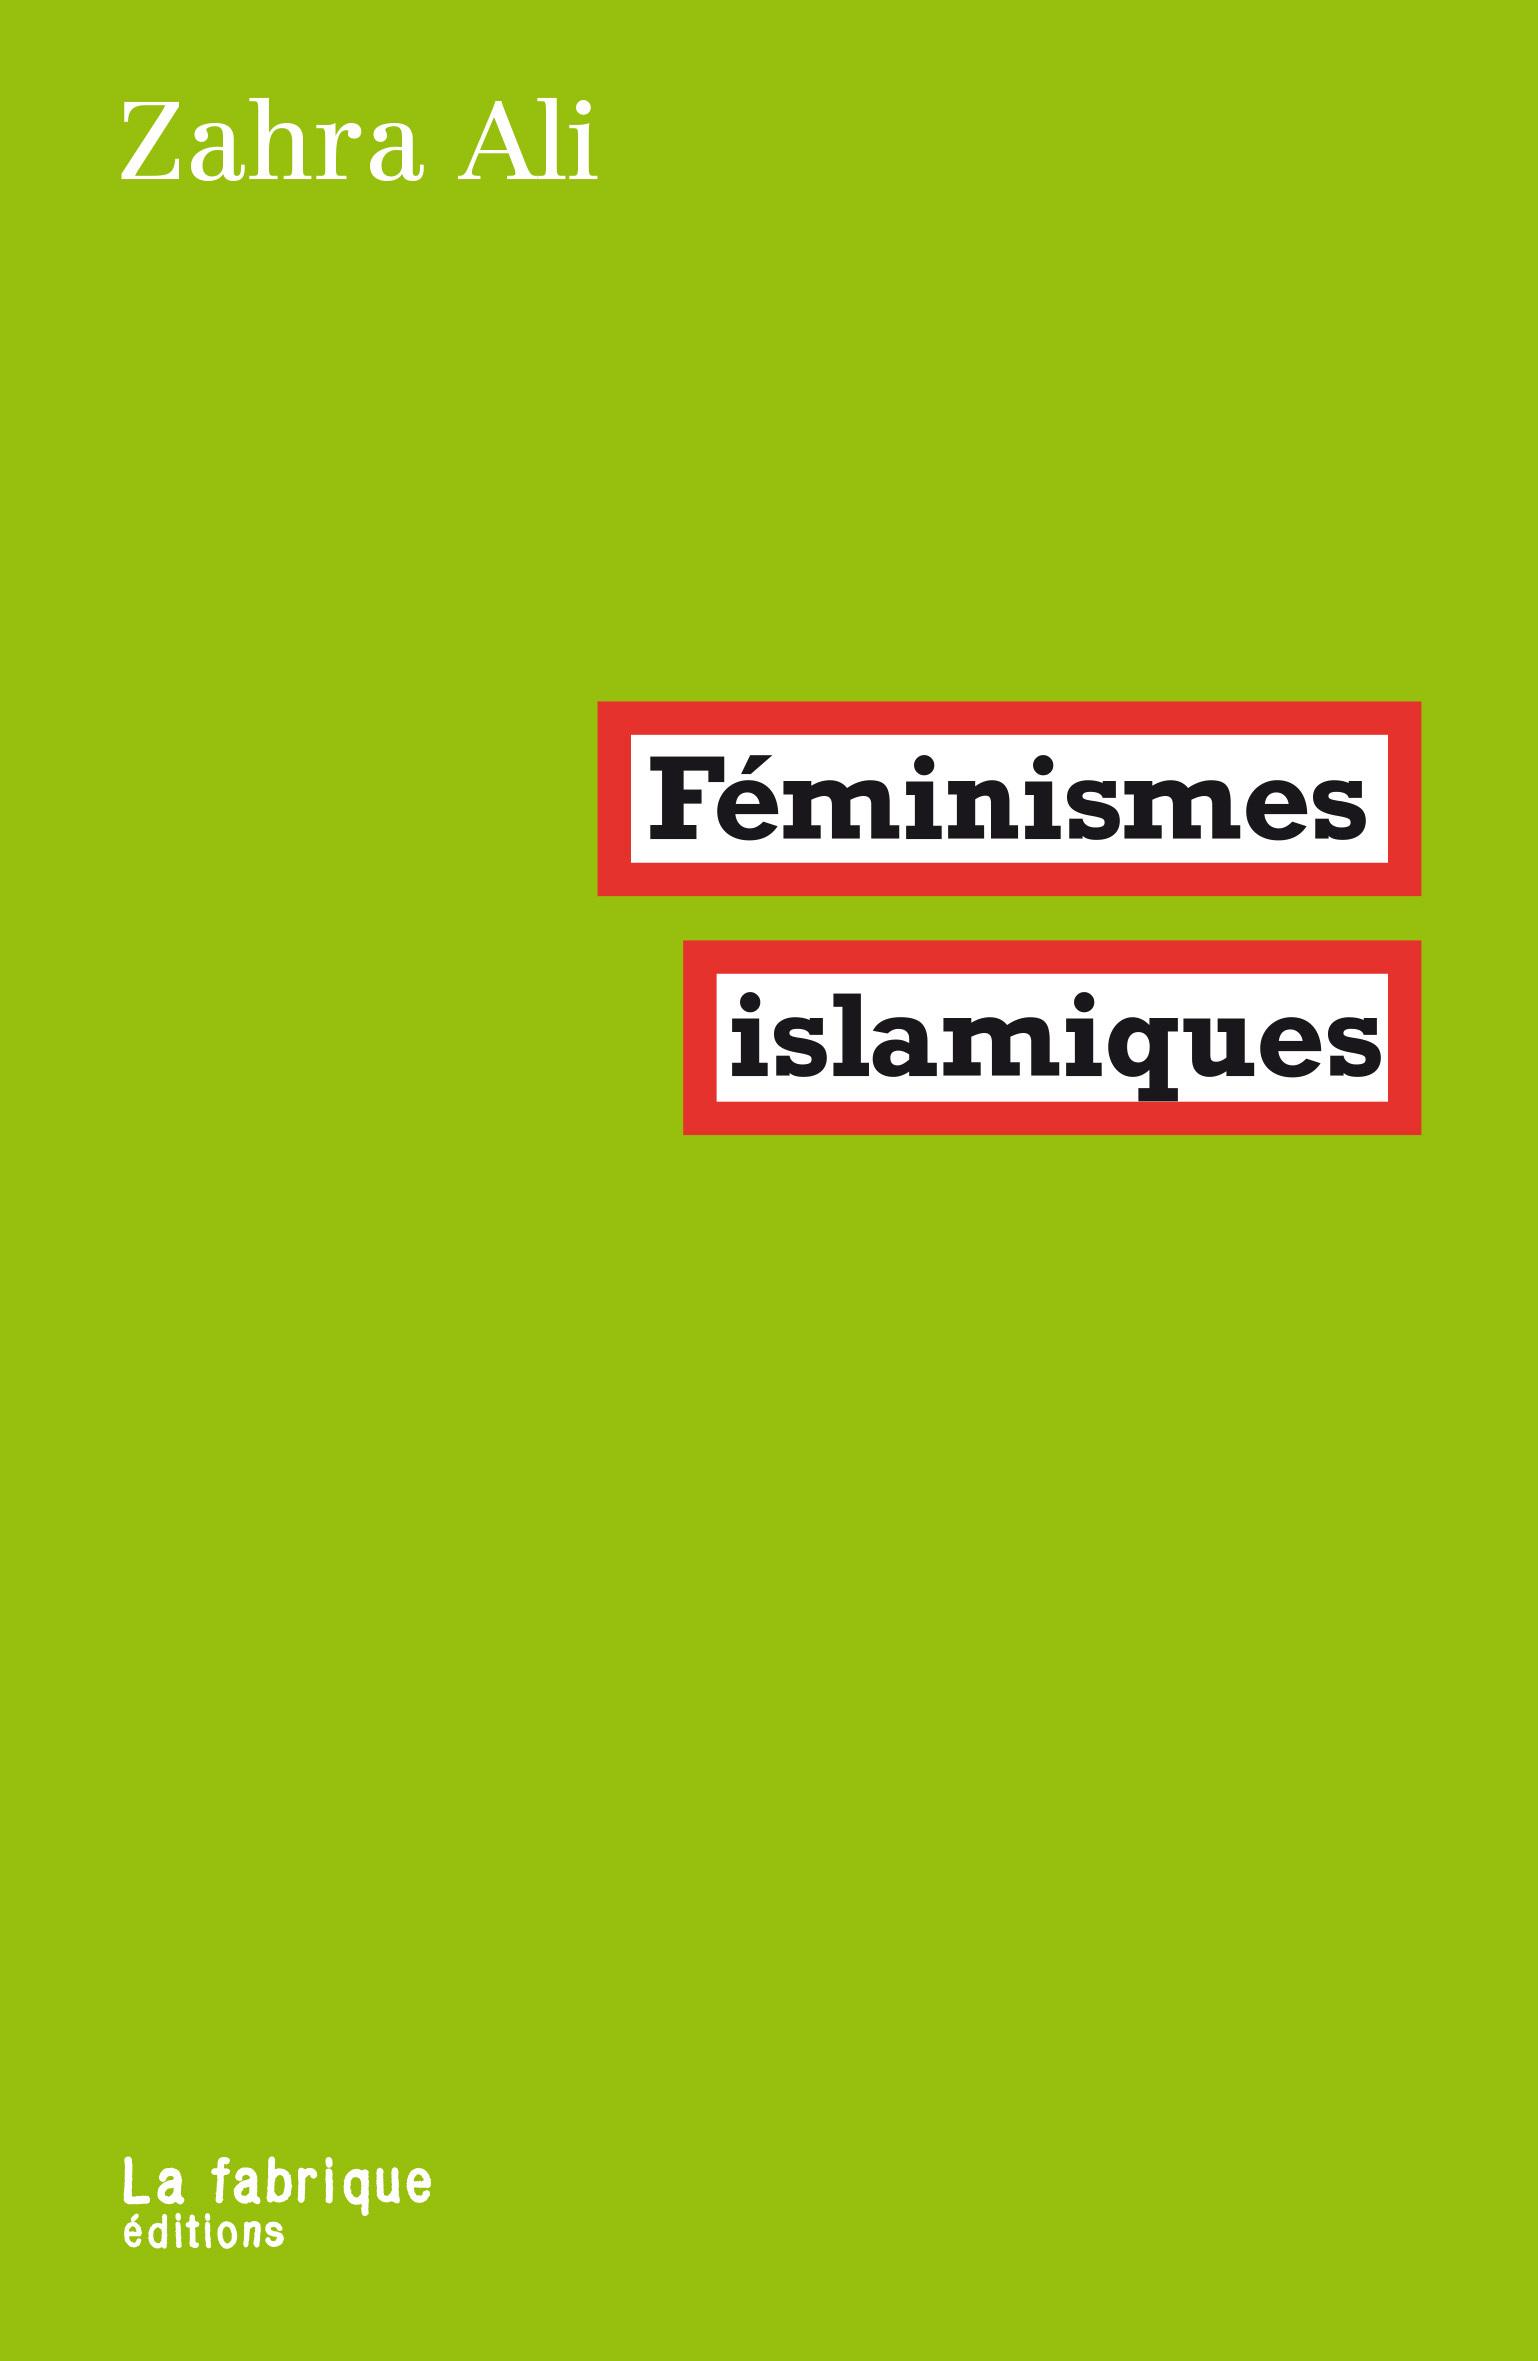 FEMINISMES ISLAMIQUES